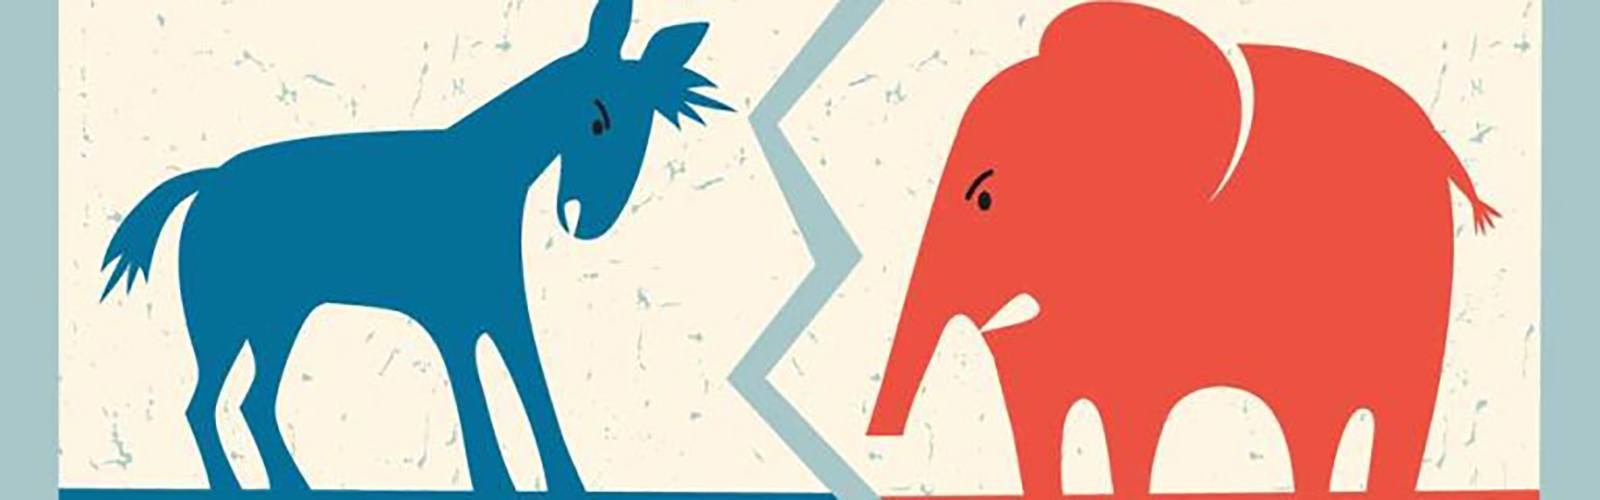 Elephant Donkey Republican Democrat Politics